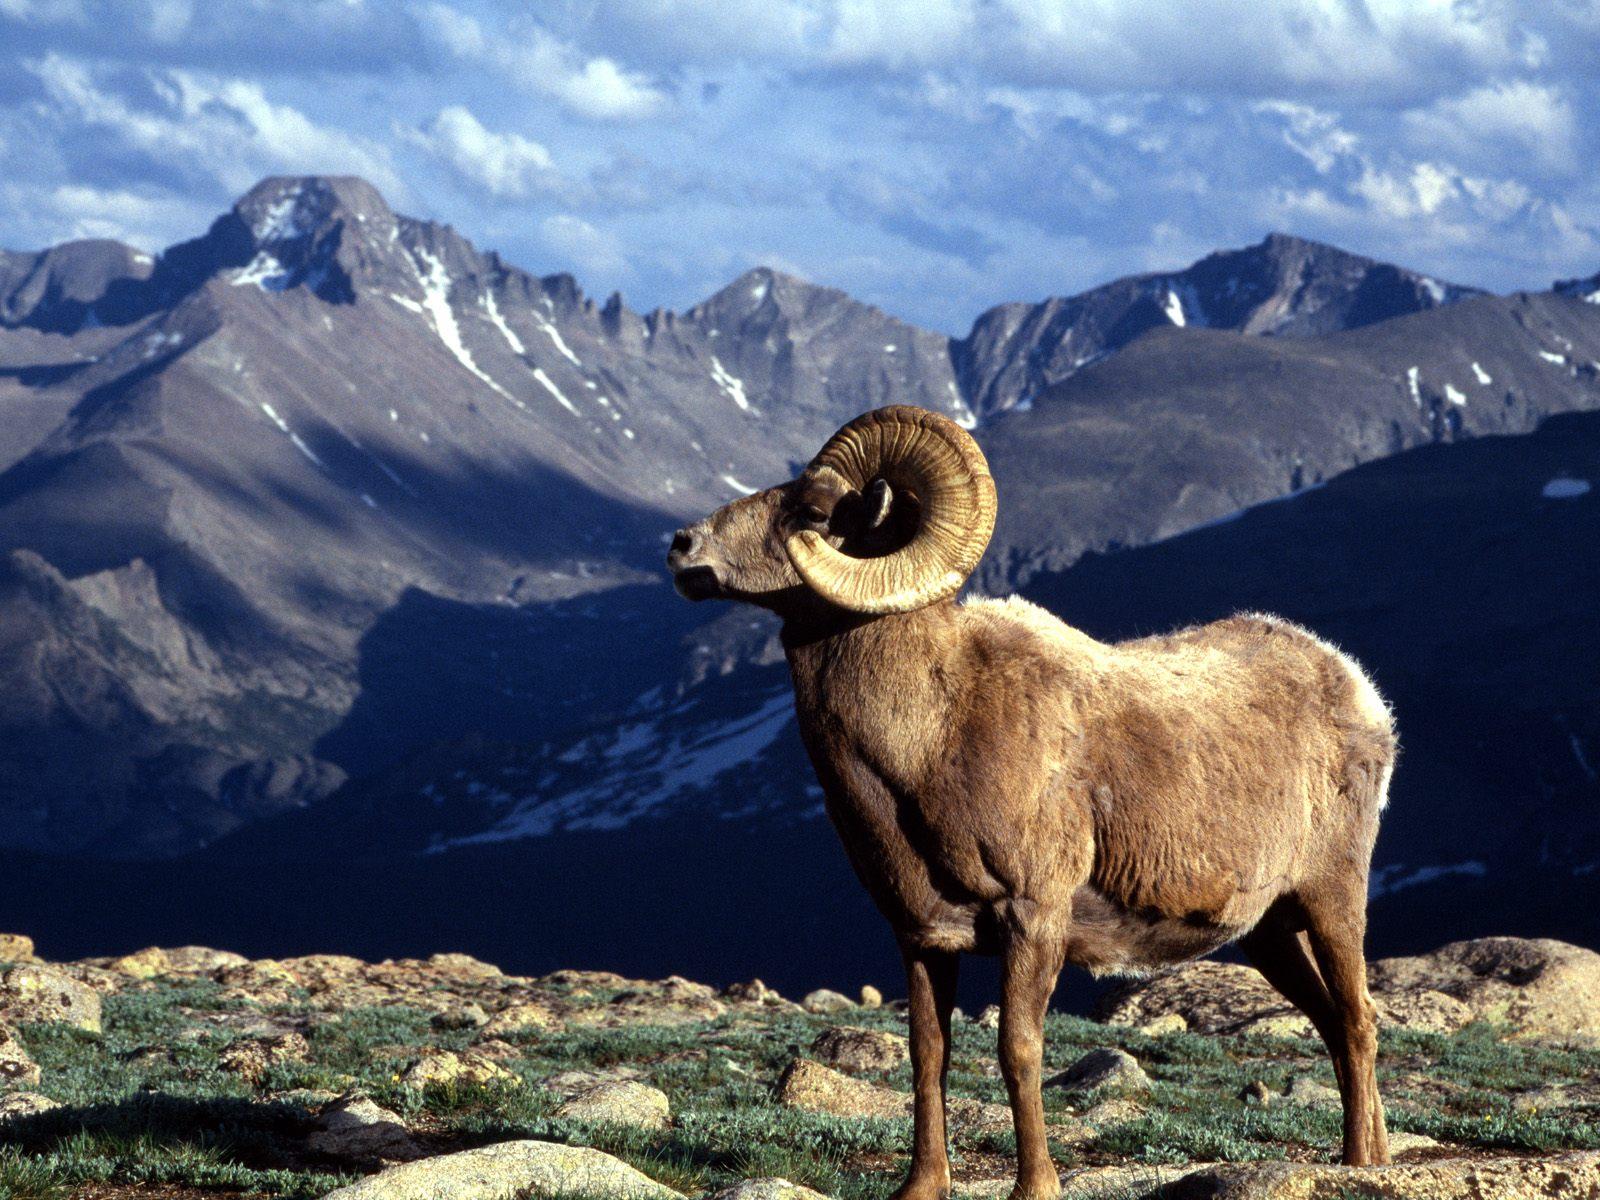 http://2.bp.blogspot.com/_PFHsbKpt1A4/TKeAa4mFH1I/AAAAAAAAACI/jRu1Qn34gjw/s1600/Big+Horn+Ram,+Rocky+Mountain+National+Park,+Colorado.jpg